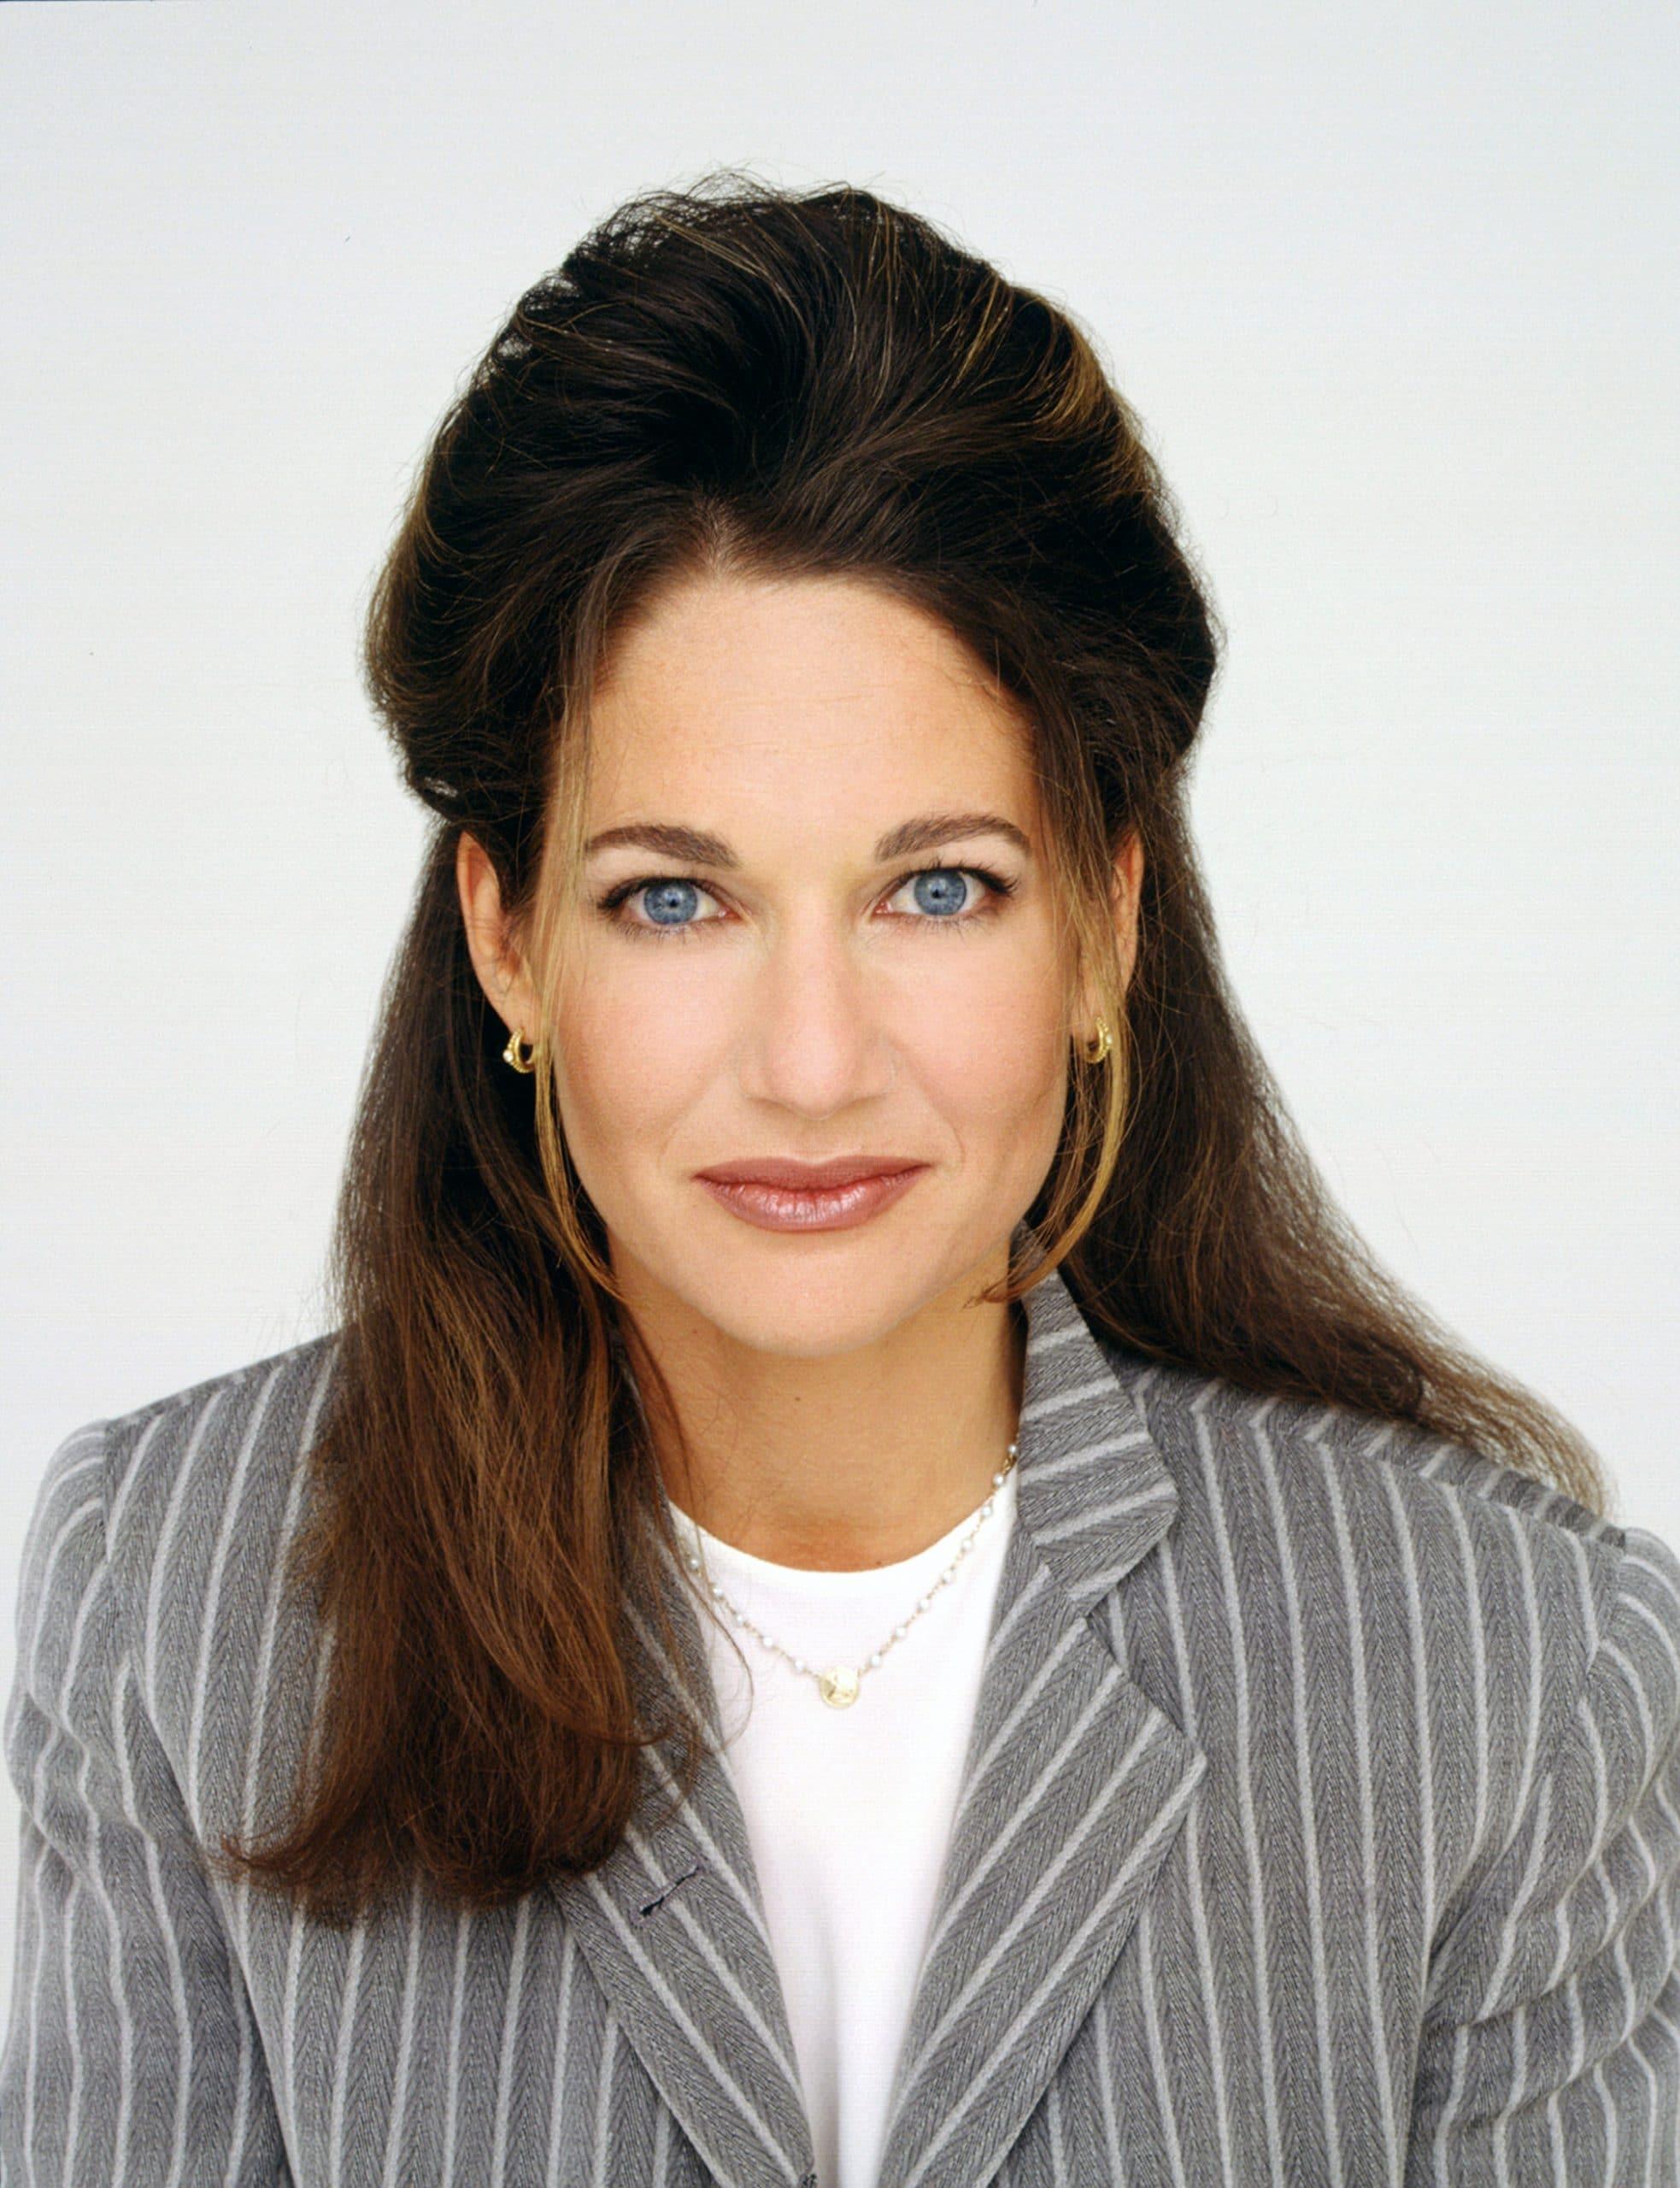 JAMIE TARSES, President, ABC Entertainment